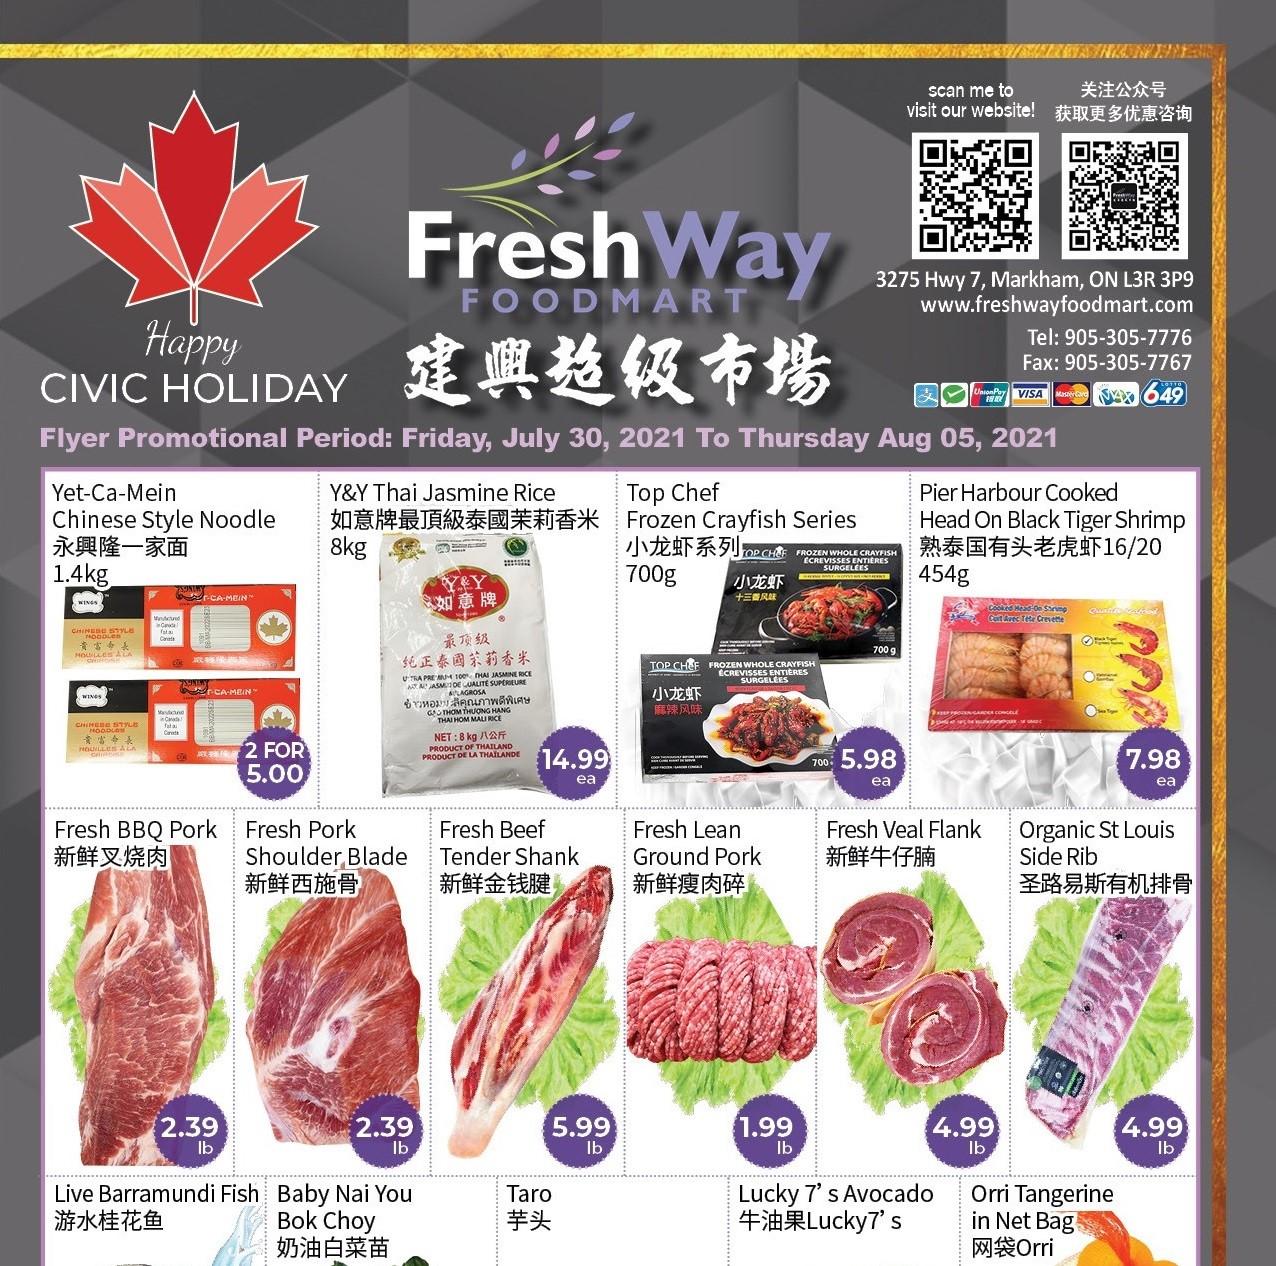 FreshWay Foodmart Flyer   Jul 30